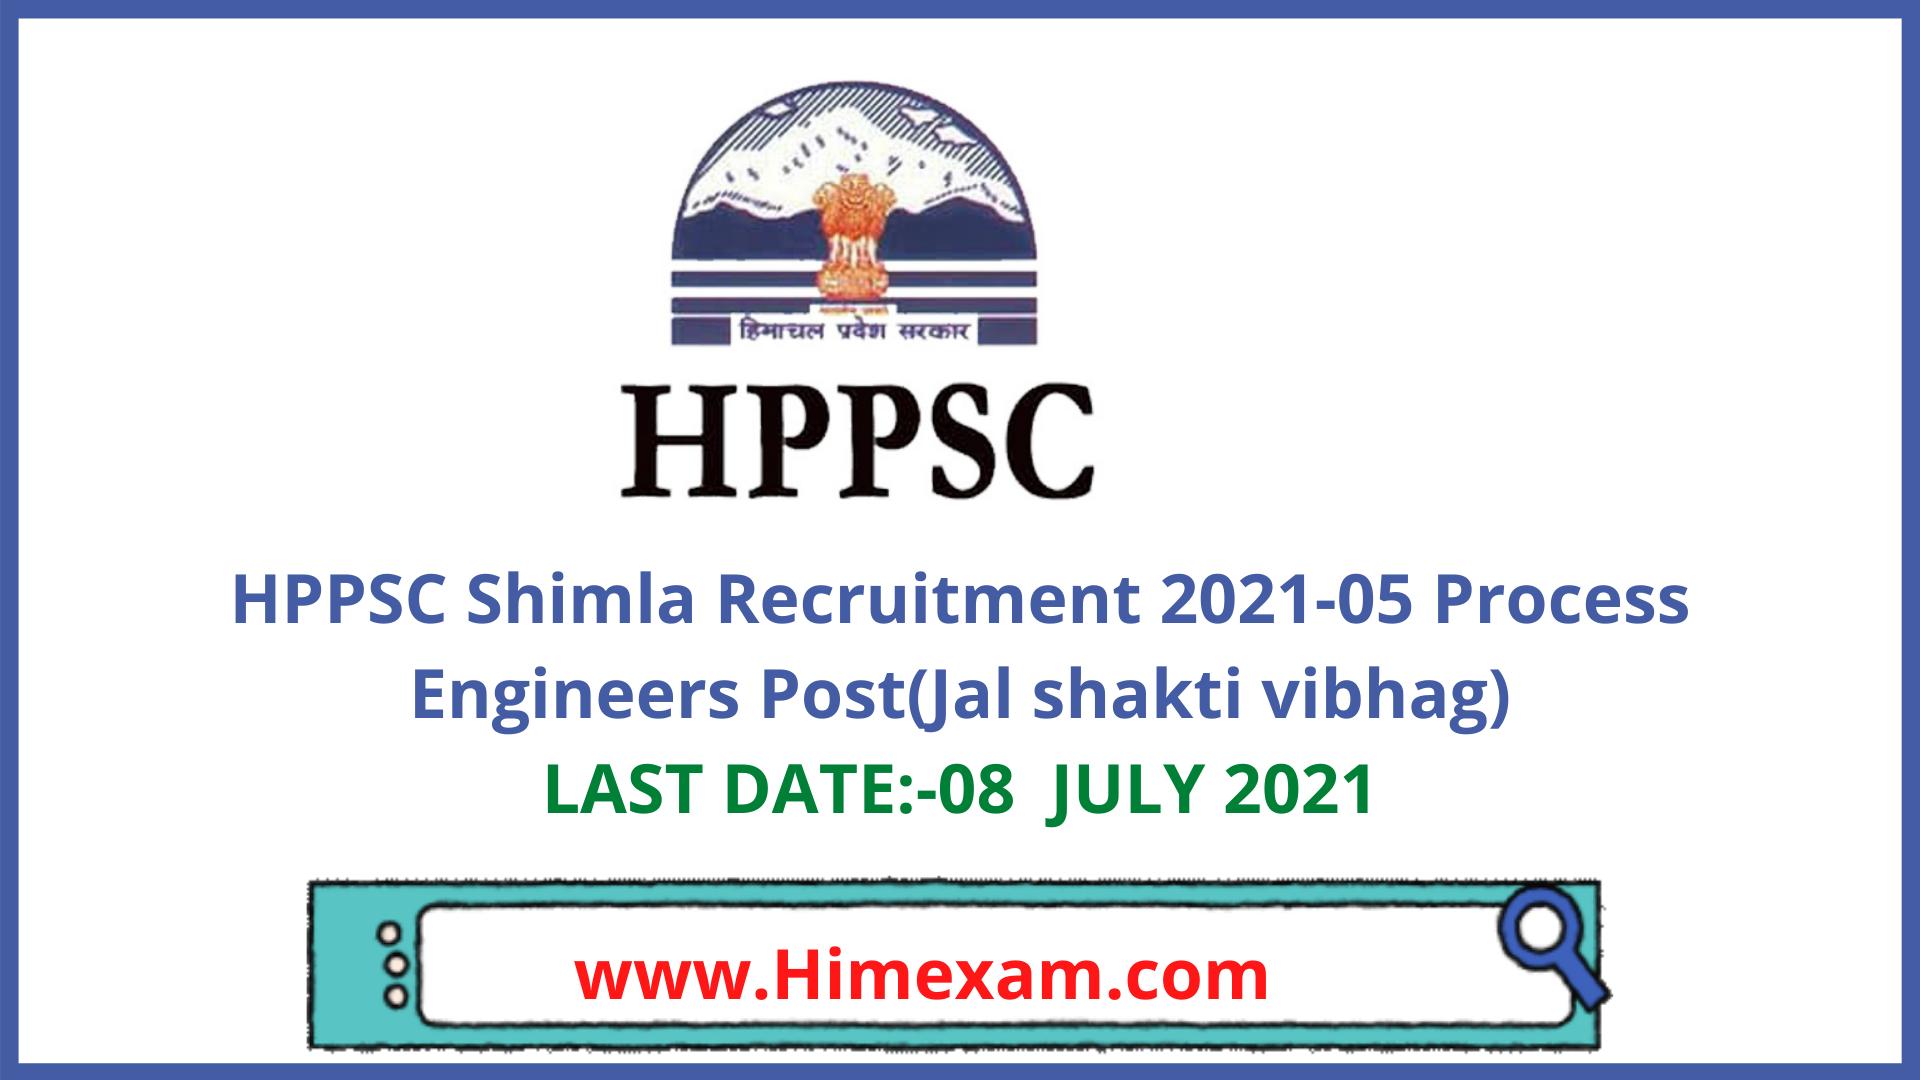 HPPSC Shimla Recruitment 2021 -05 Process Engineer Posts(Jal Shakti Vibhag)